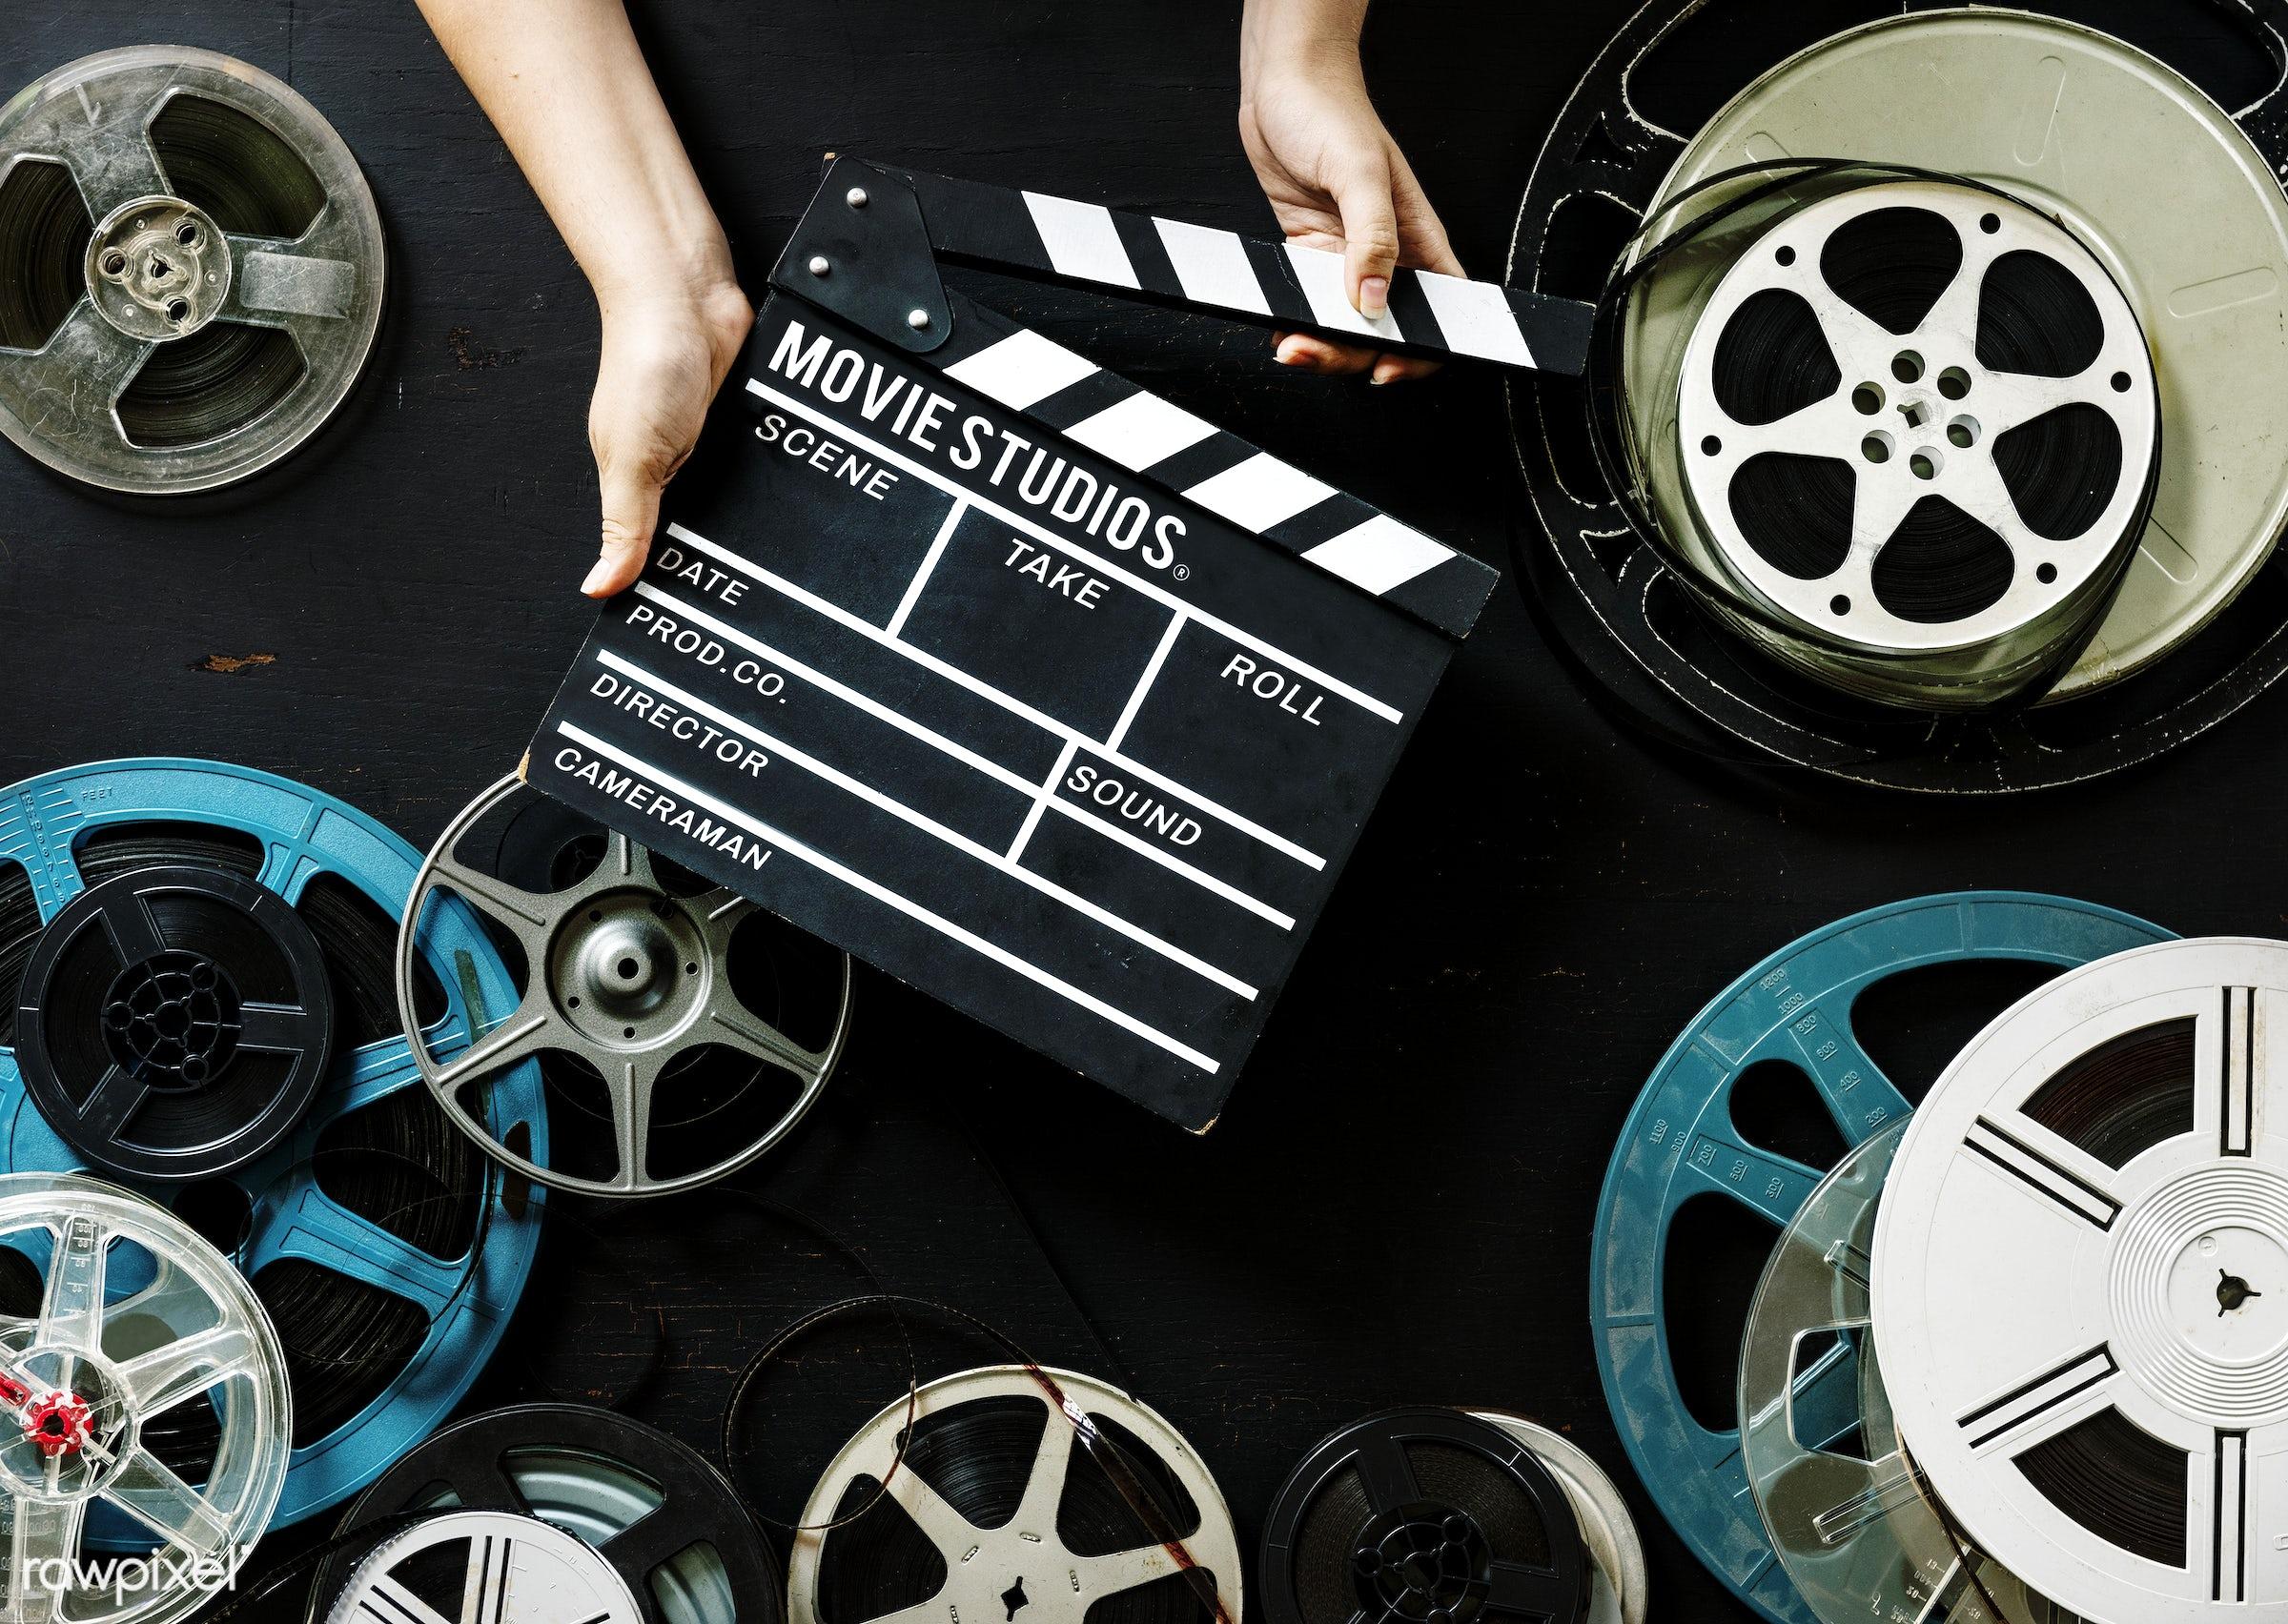 Hand hold a film strip - movie, video, cinema, action, analog, antique, entertainment, equipment, film, film strip, hands,...